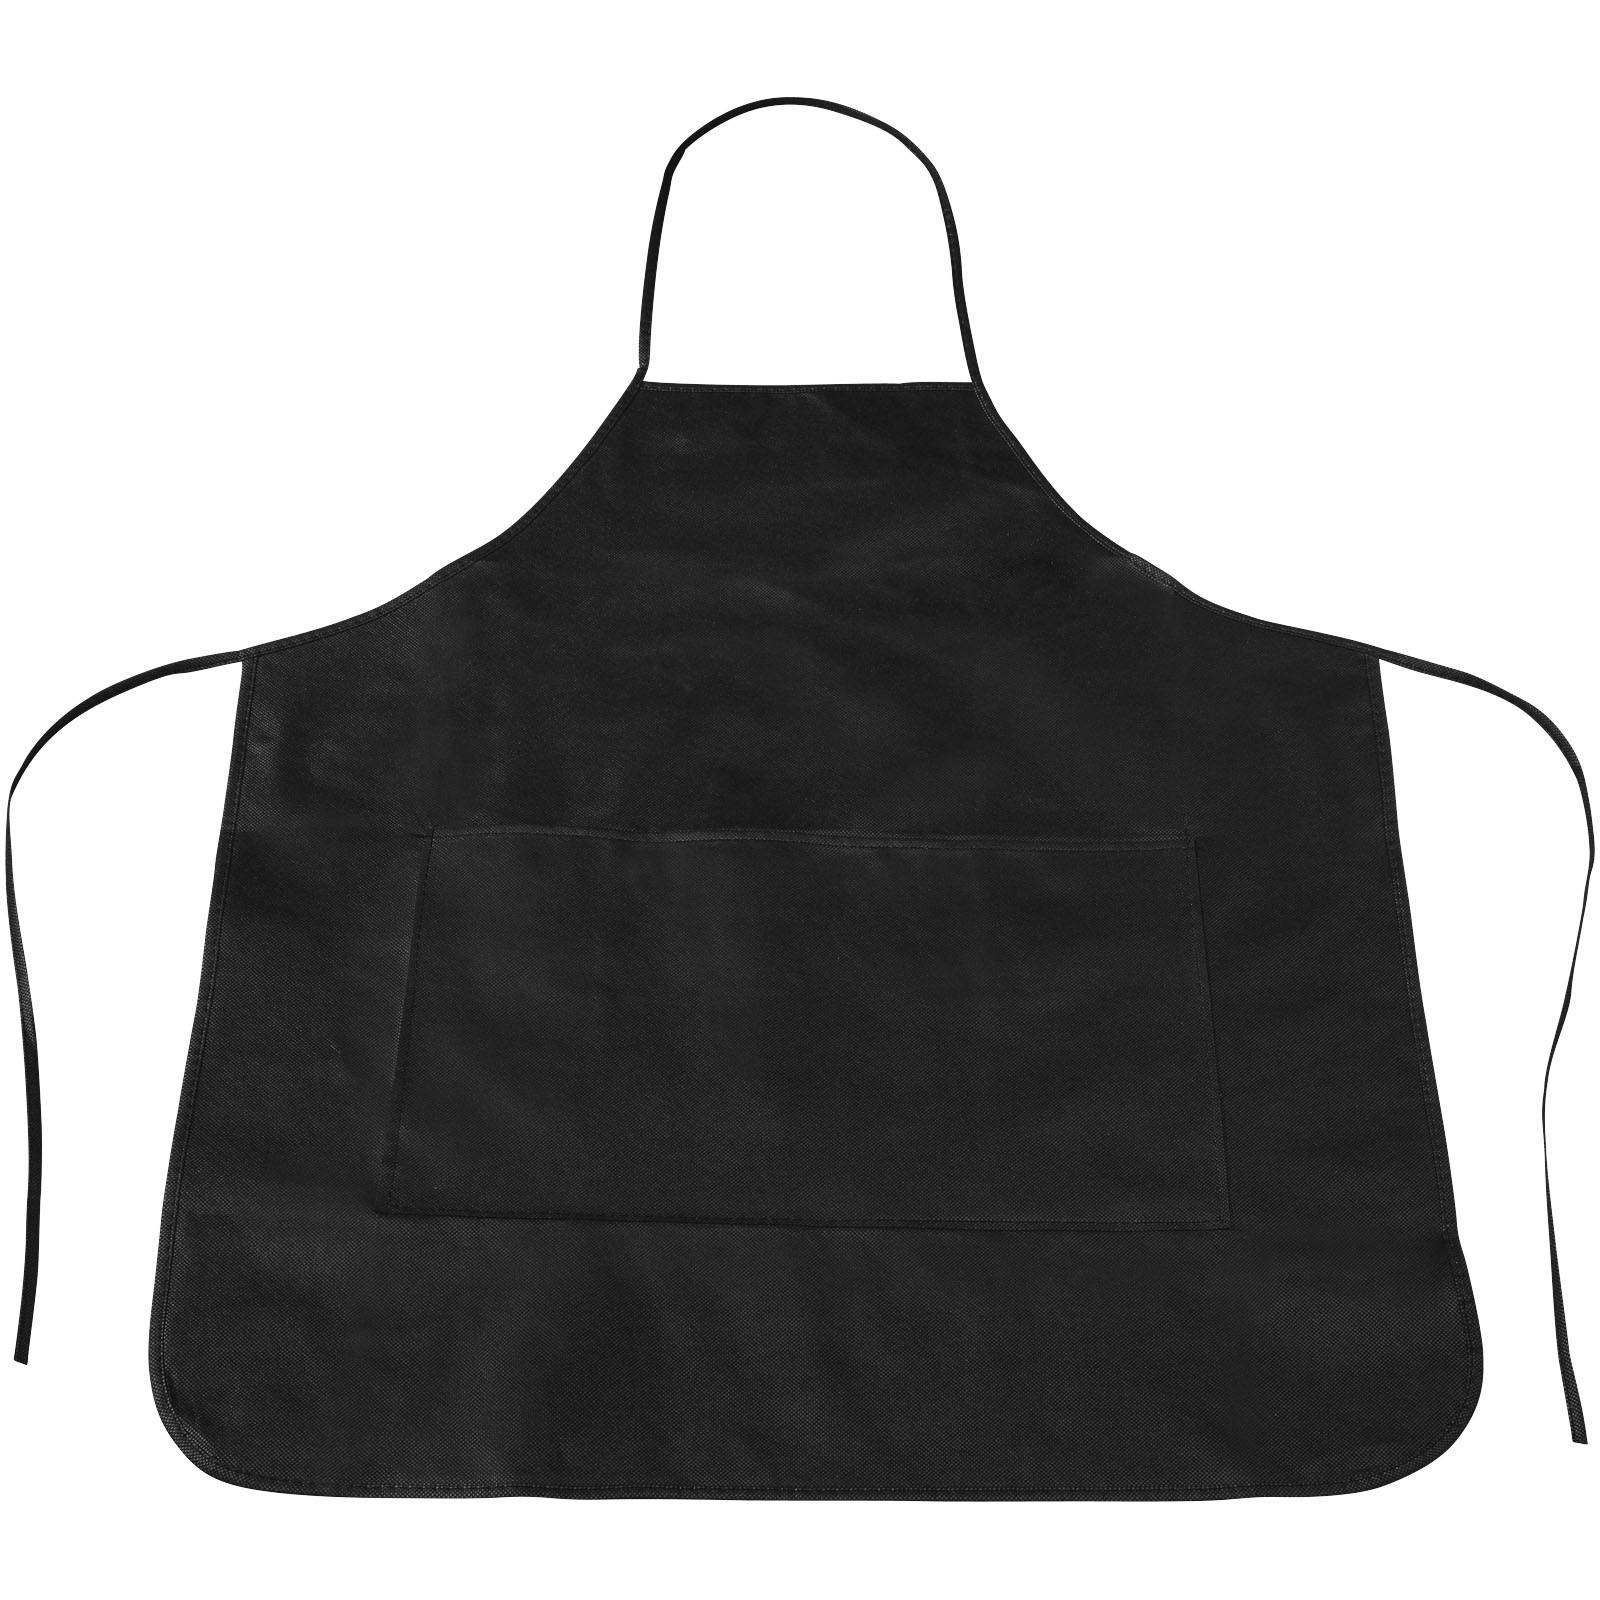 Zástěra Cocina